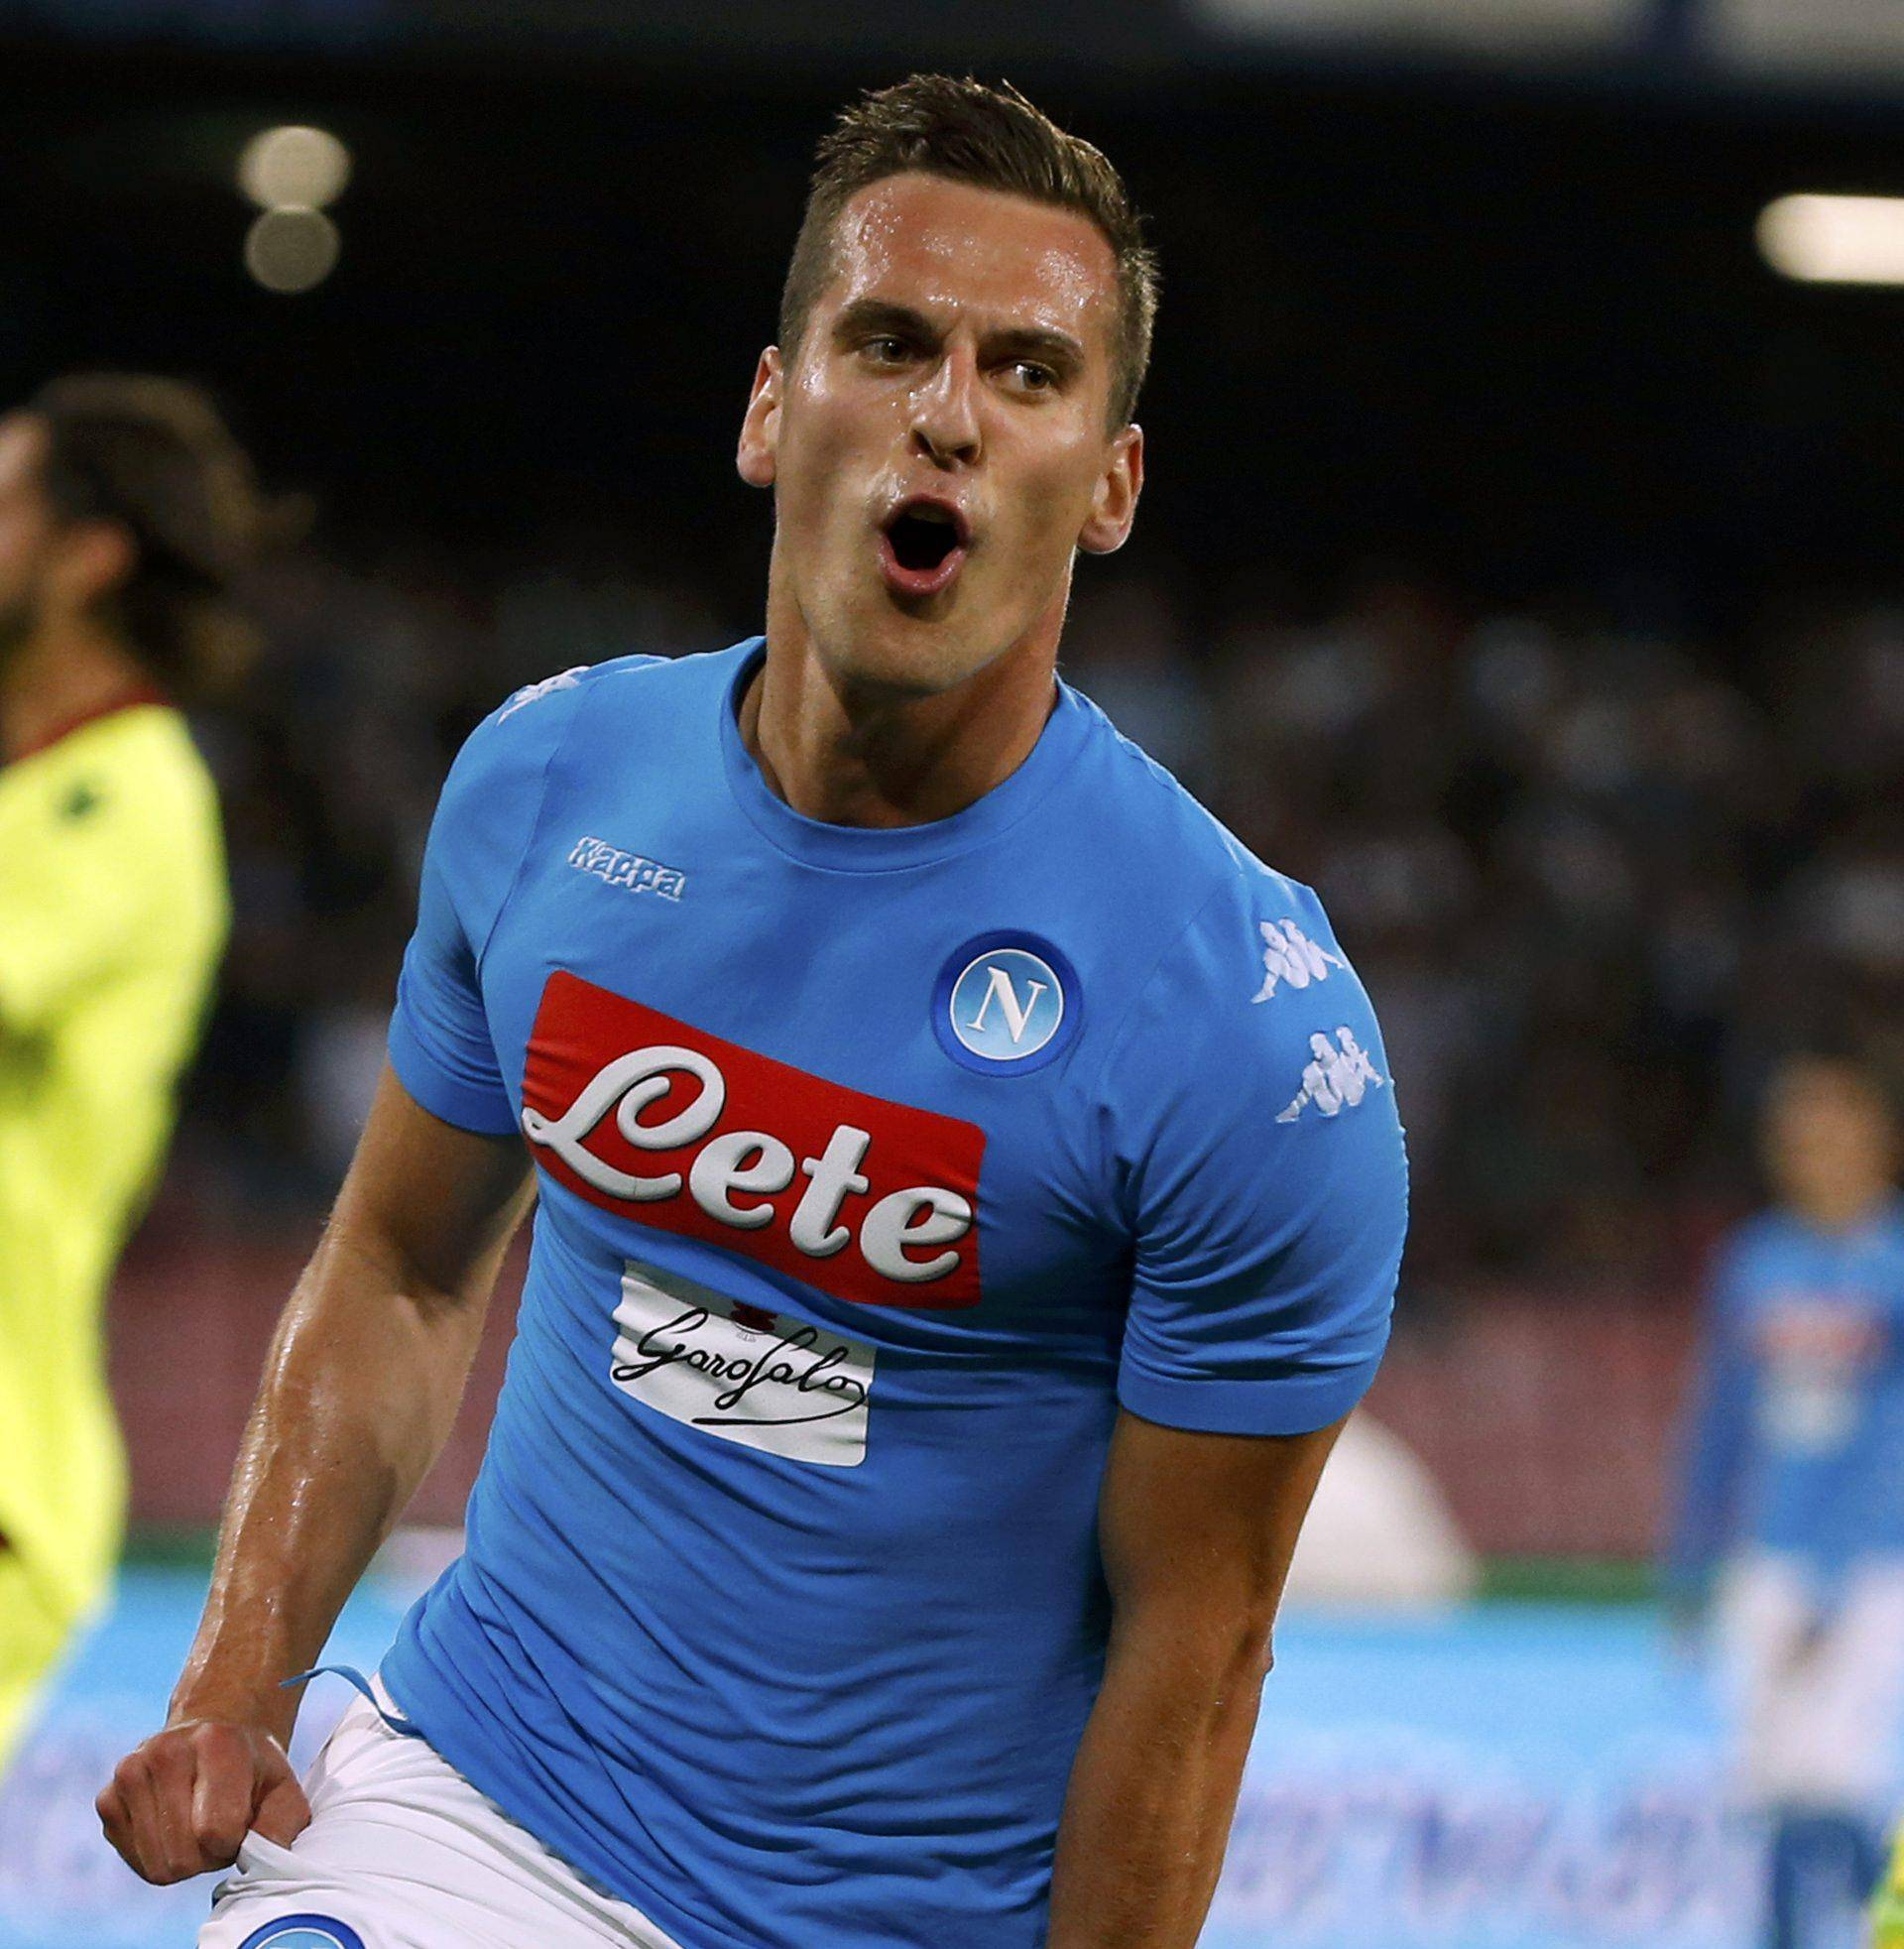 Football - Soccer - Napoli v Bologna - Italian Serie A